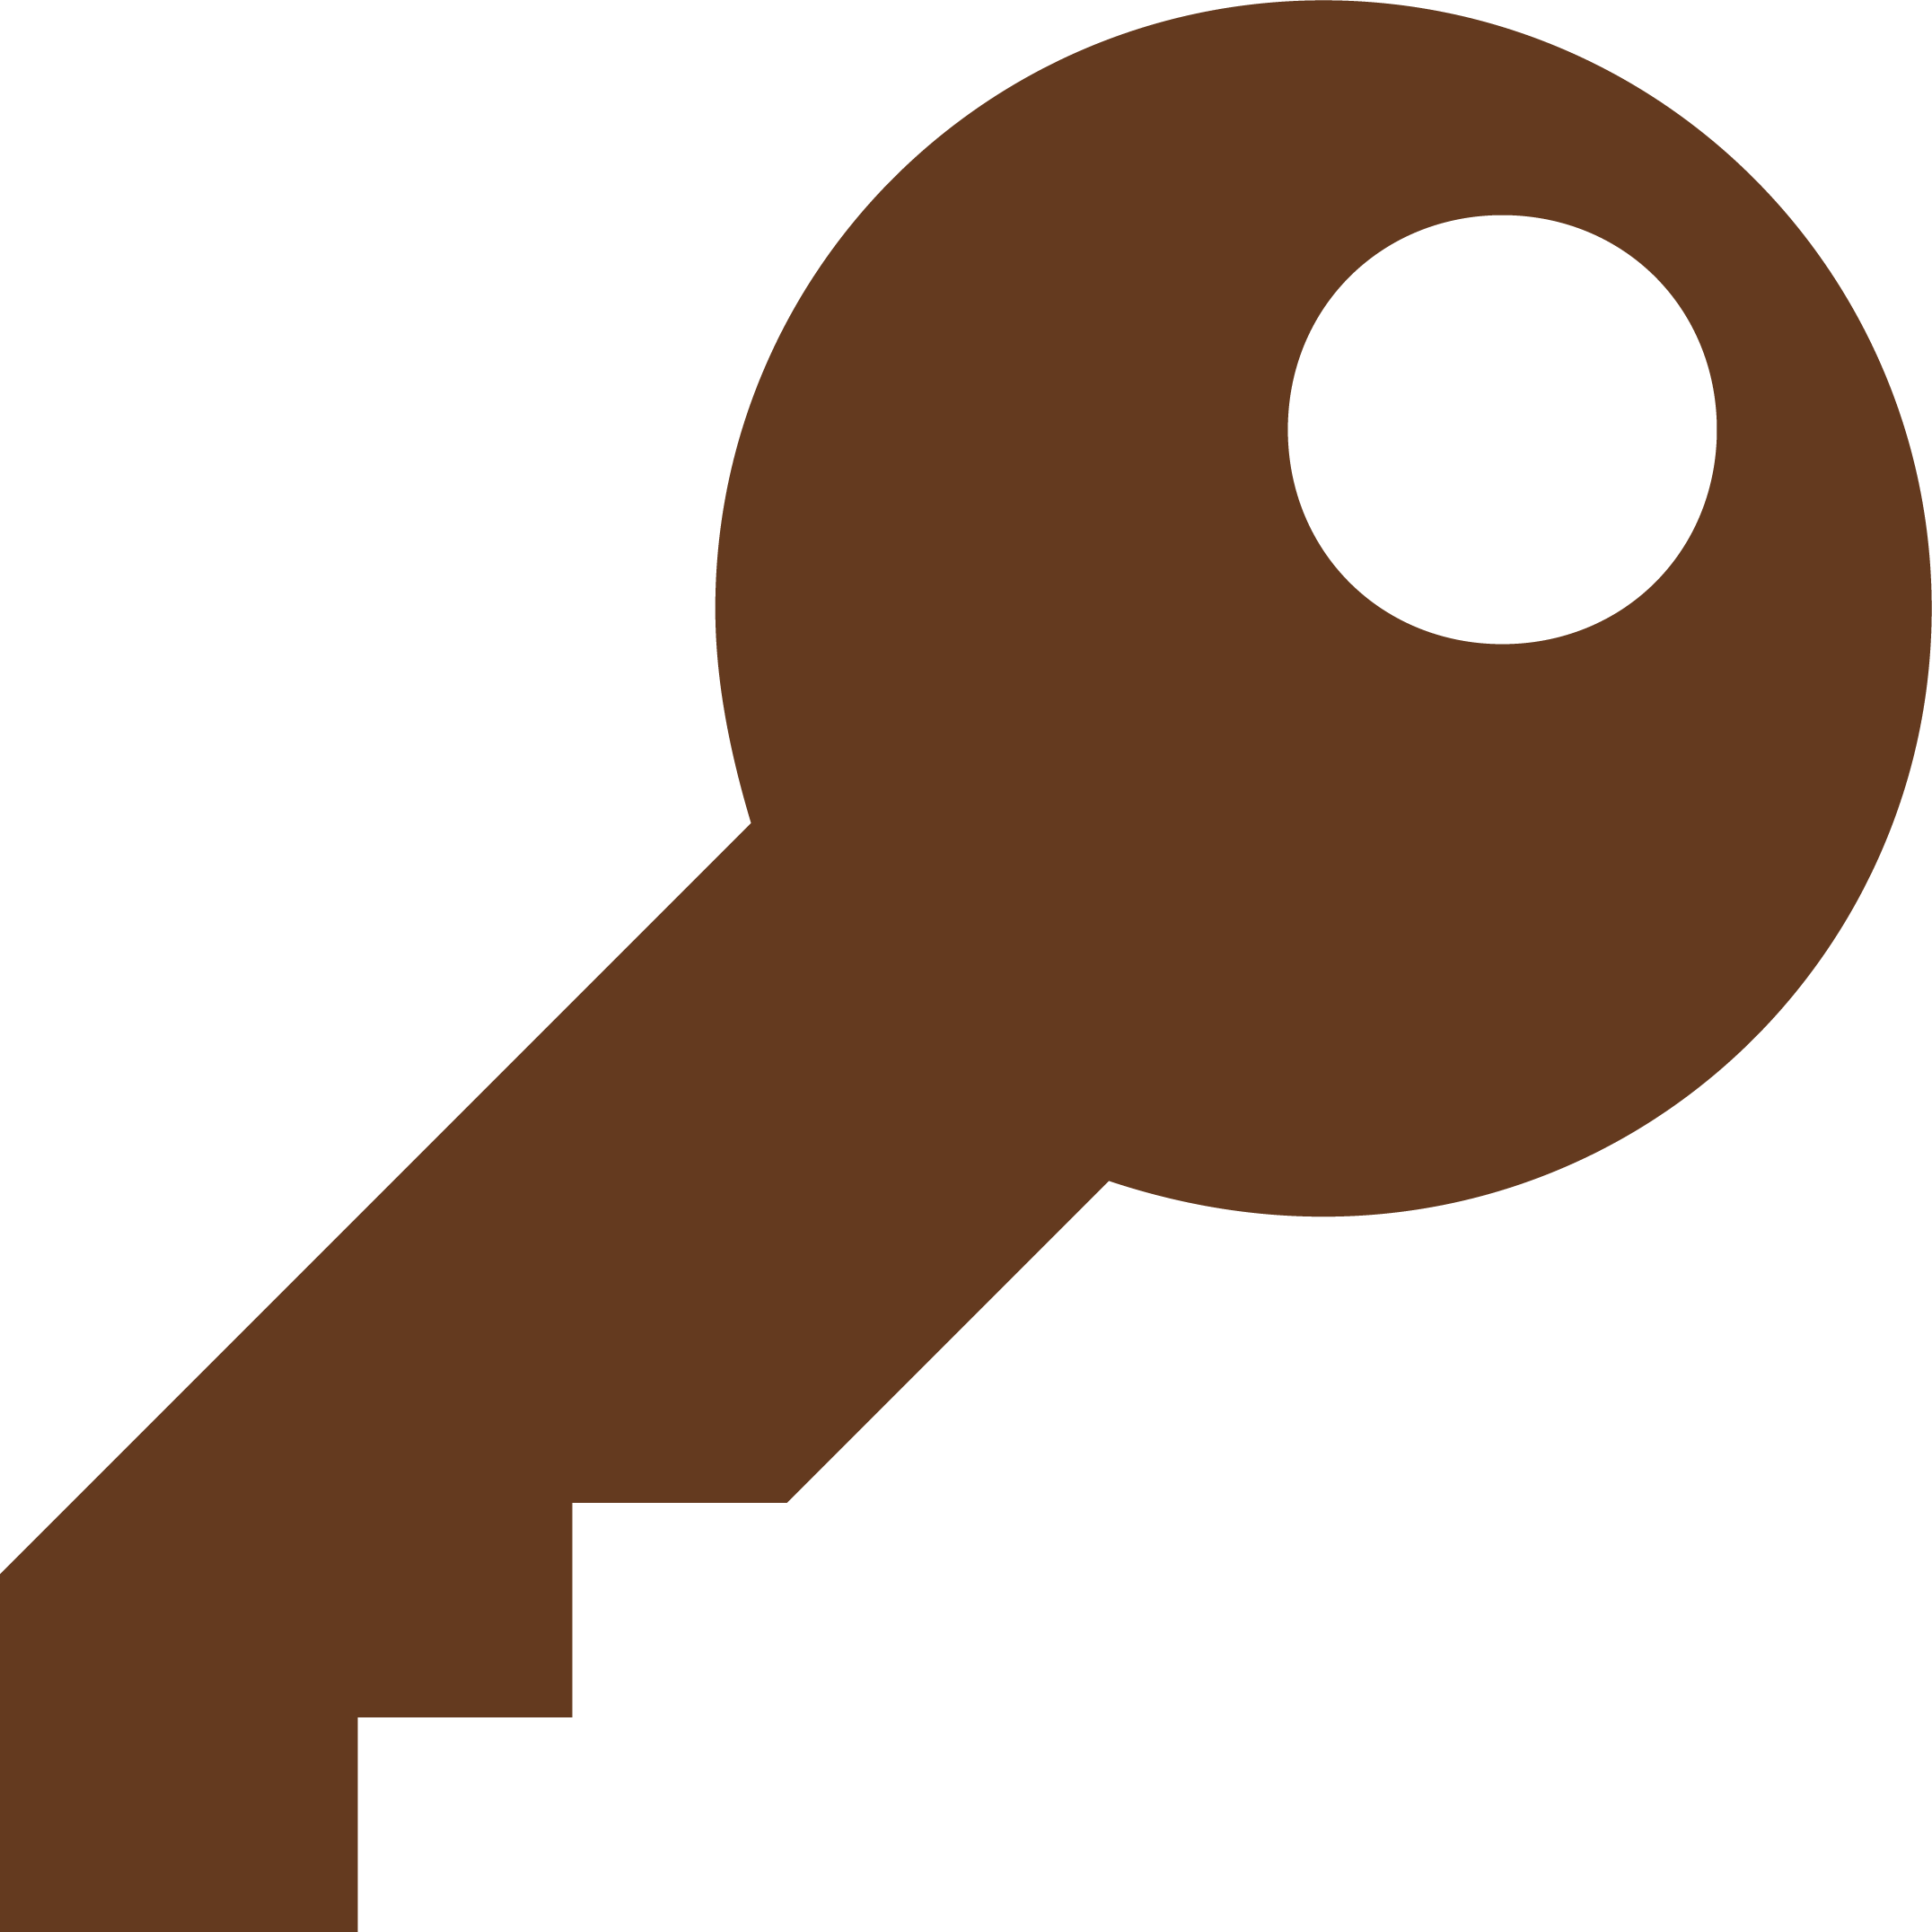 icone clé